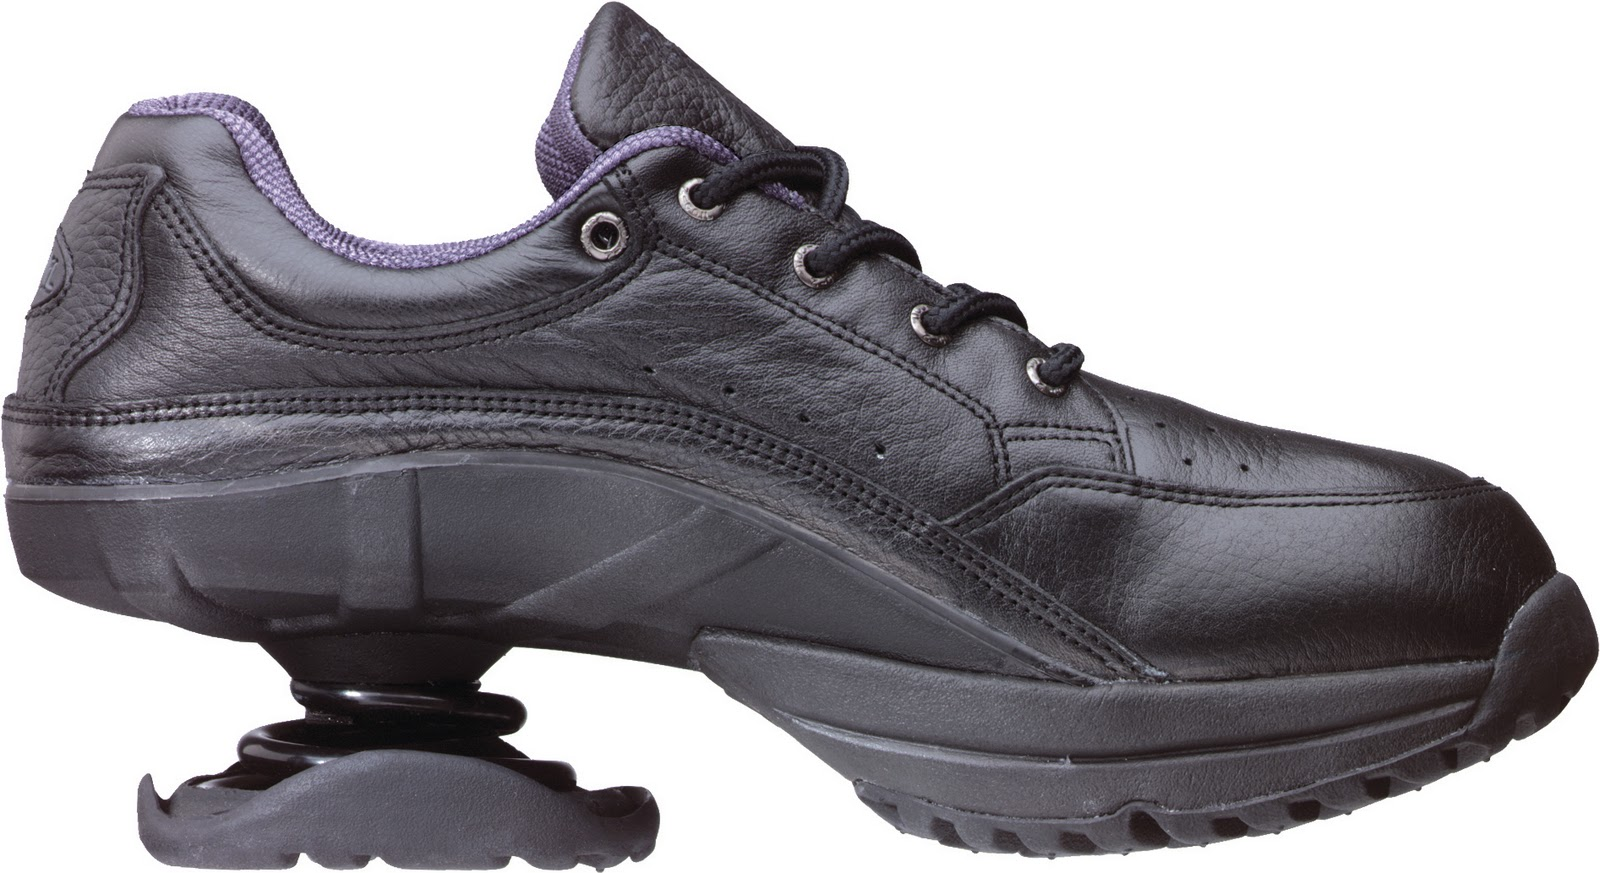 cc63fc06b34 Z-CoiL® Pain Relief Footwear™